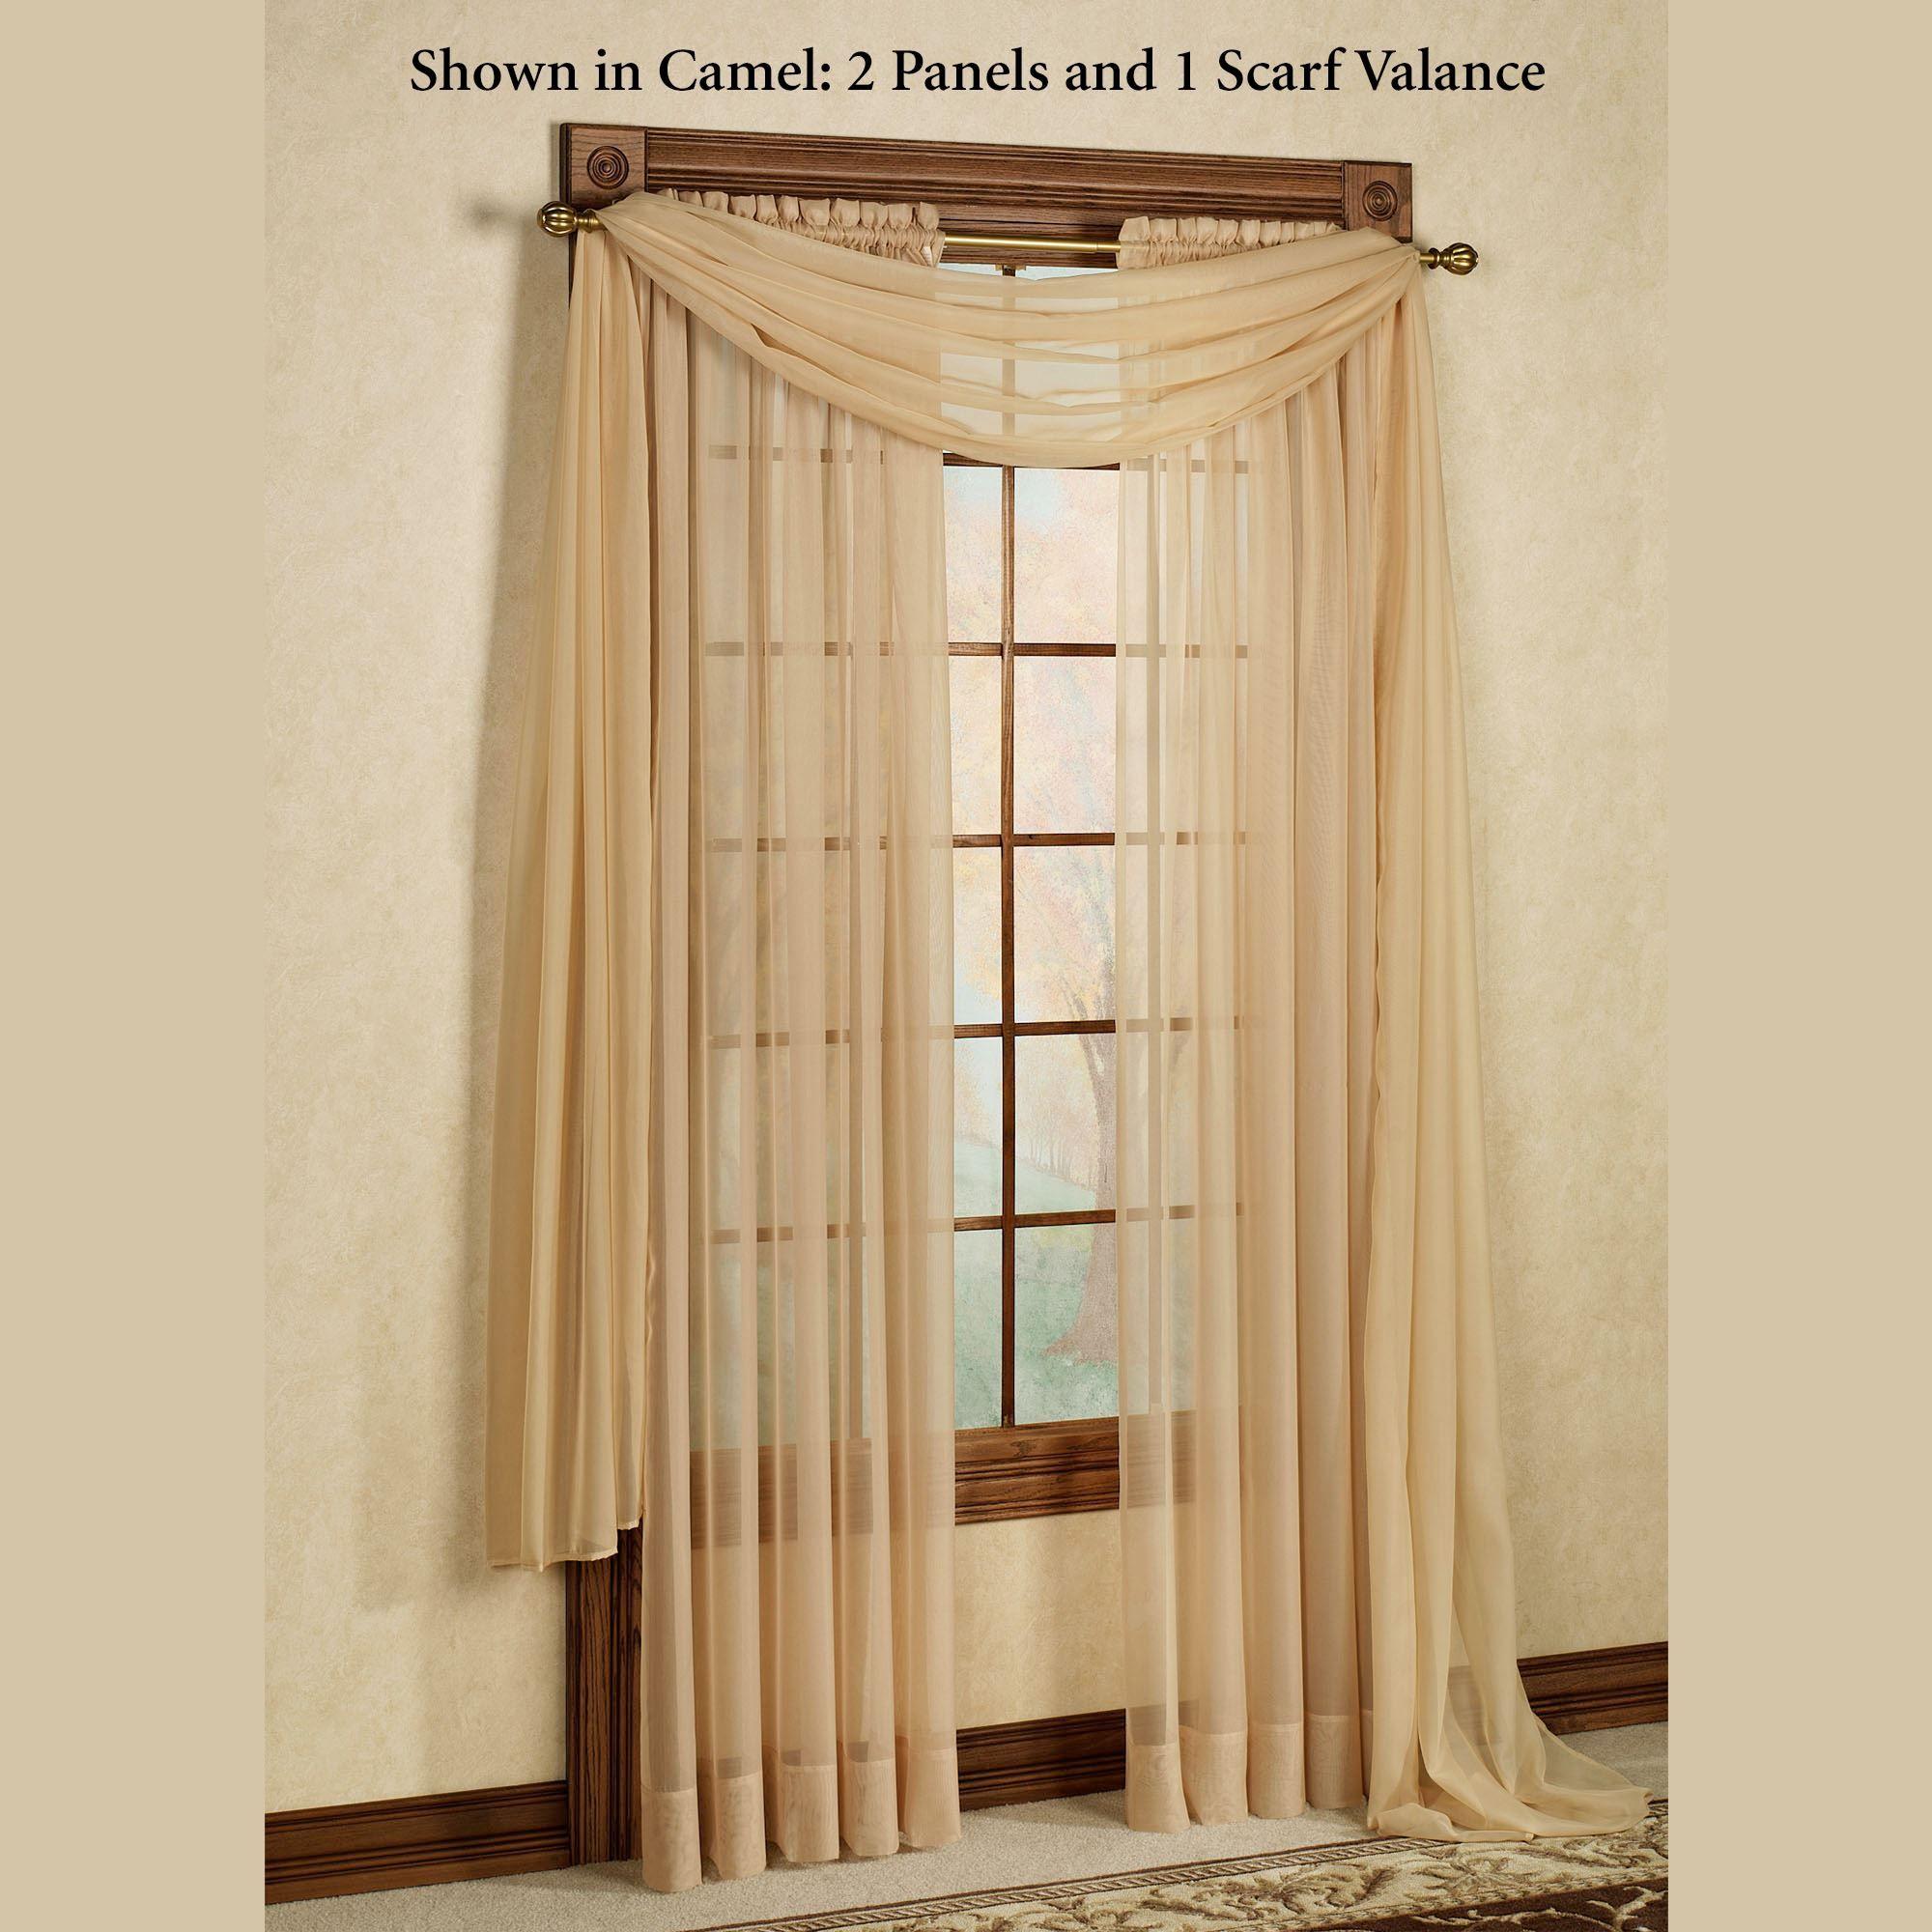 in panels roman color treatments with lif drapery lynn curtain richmond flat custom block window shade interiormp winchester